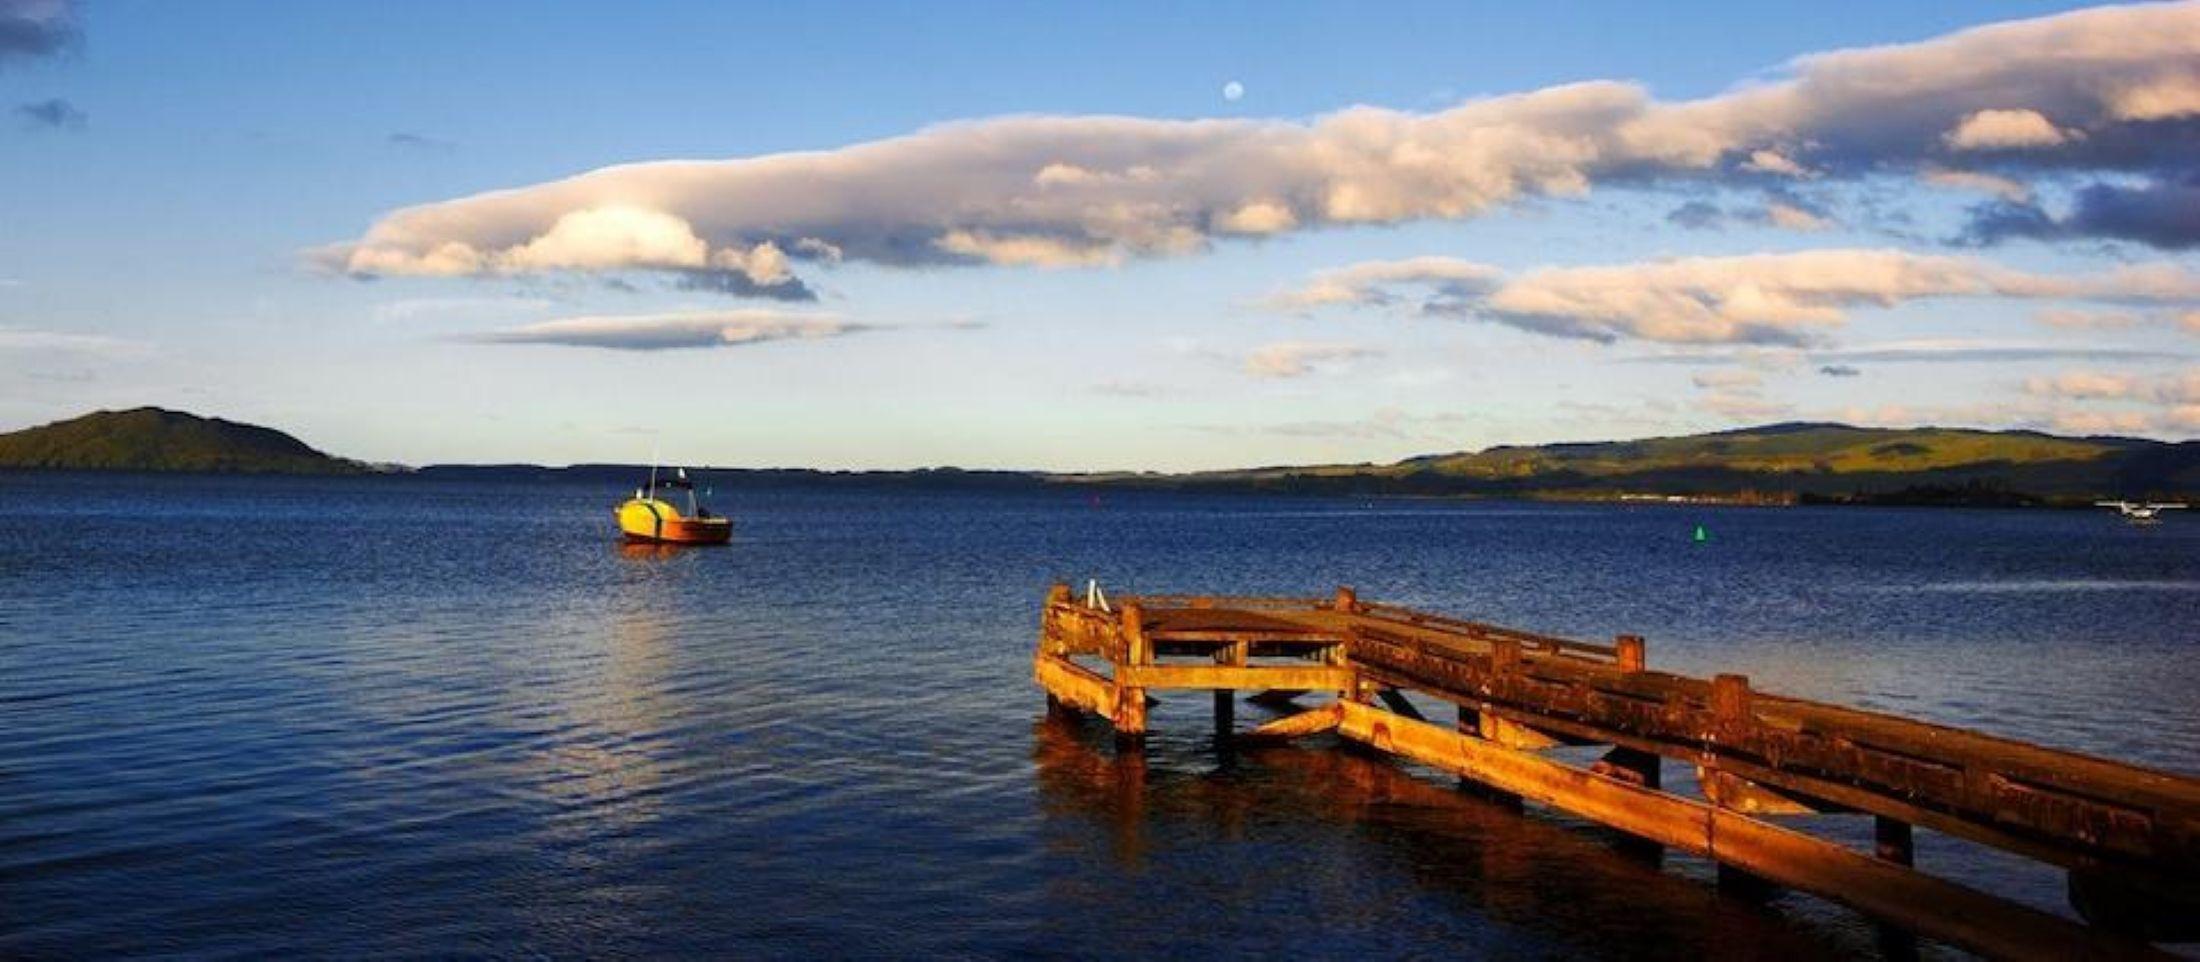 View of a pier on Lake Rotorua